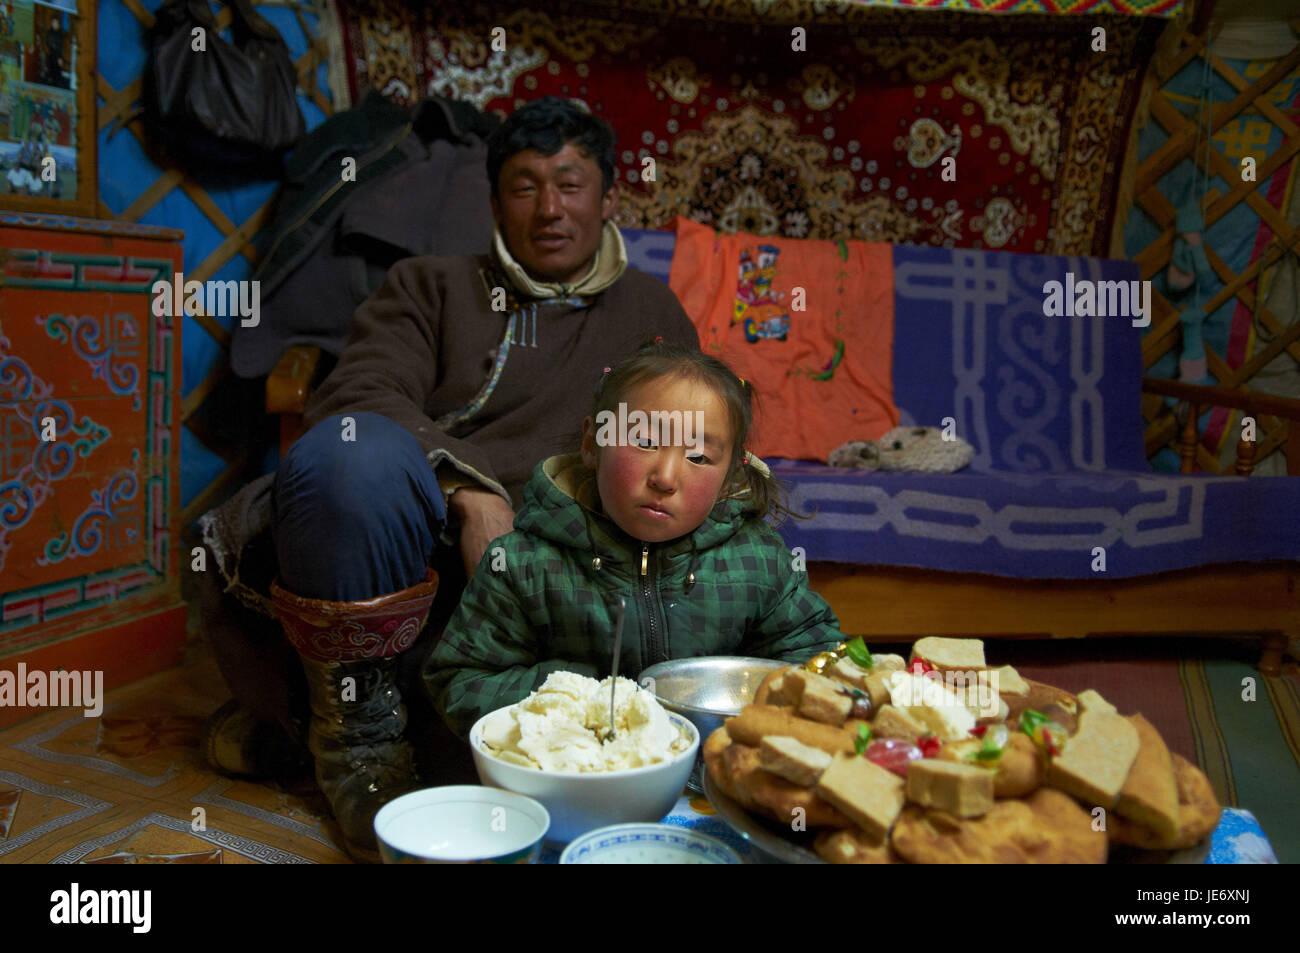 Mongolia, provincia de Khovd, invierno, Jurte, inside, nómadas, joven con hijo, Imagen De Stock